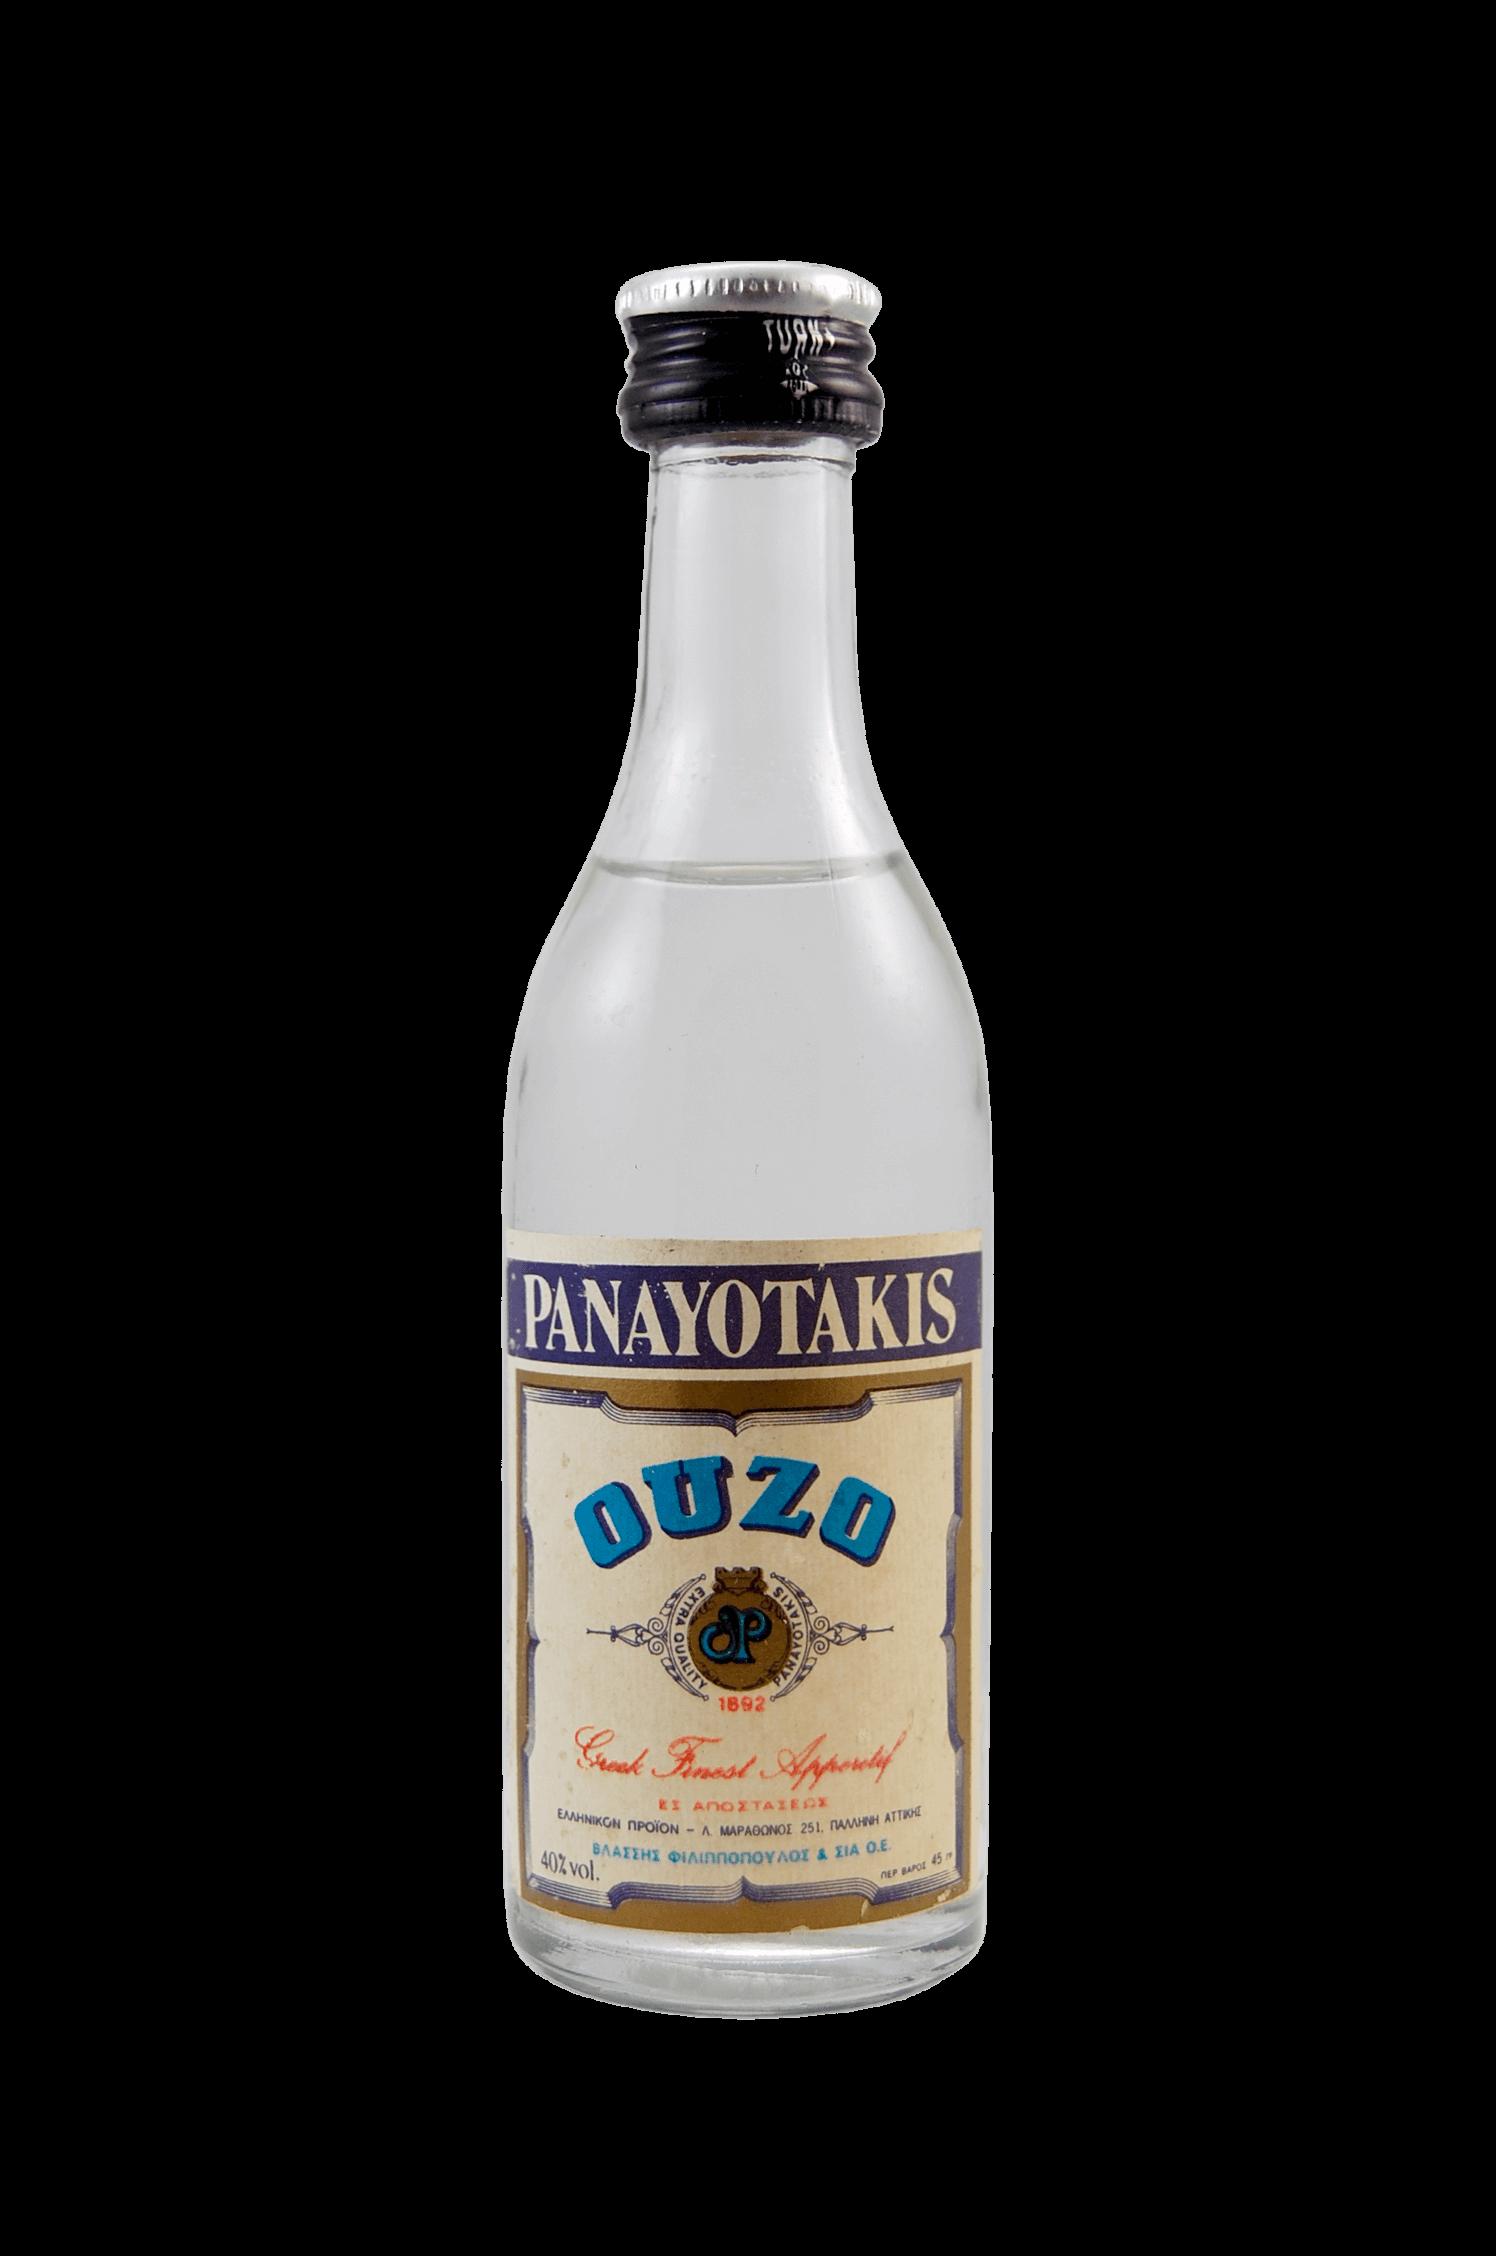 Panayotakis Ouzo